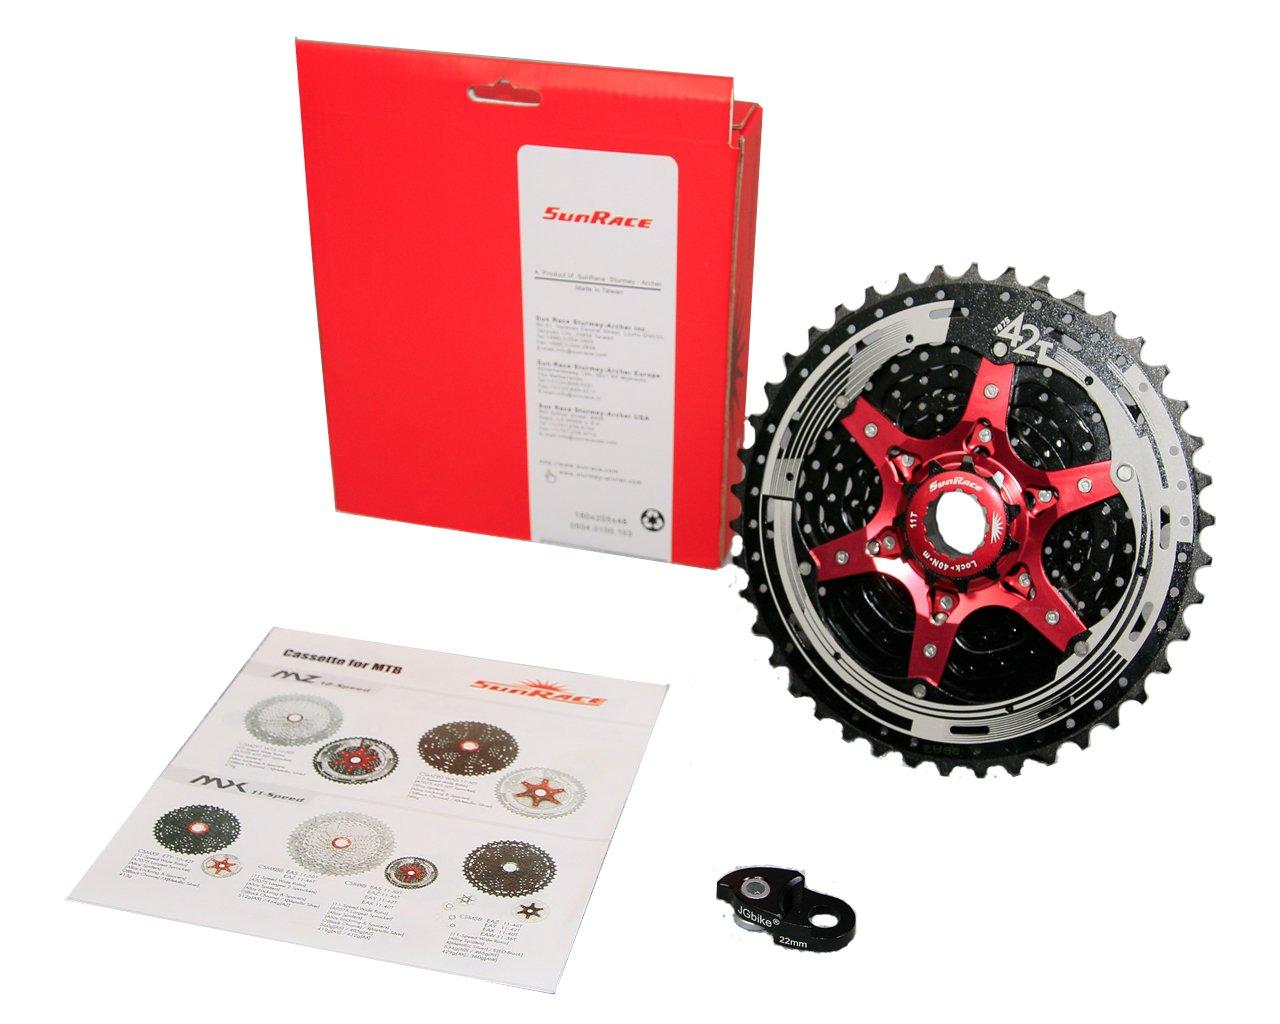 JGbike Sunrace 10 Speed Cassette 11-42T CSMX3 Black Wide Ratio MTB Cassette for Mountain Bike Including Extender